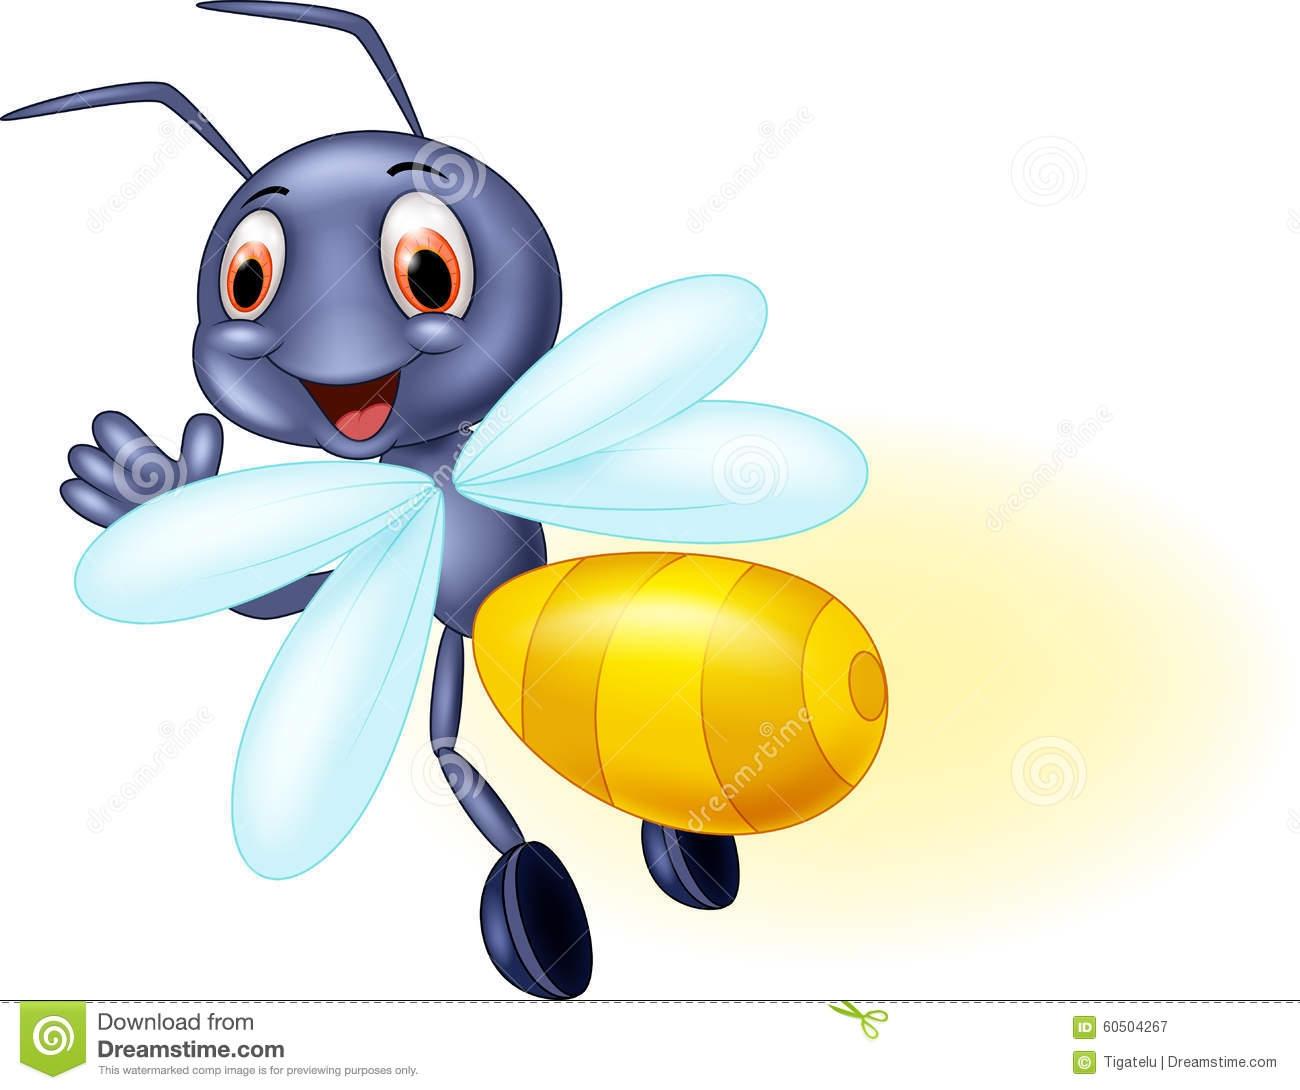 firefly clipart - 8 - i - Firefly Stock Illustrations u2013 1 400 Firefly Stock  Illustrations